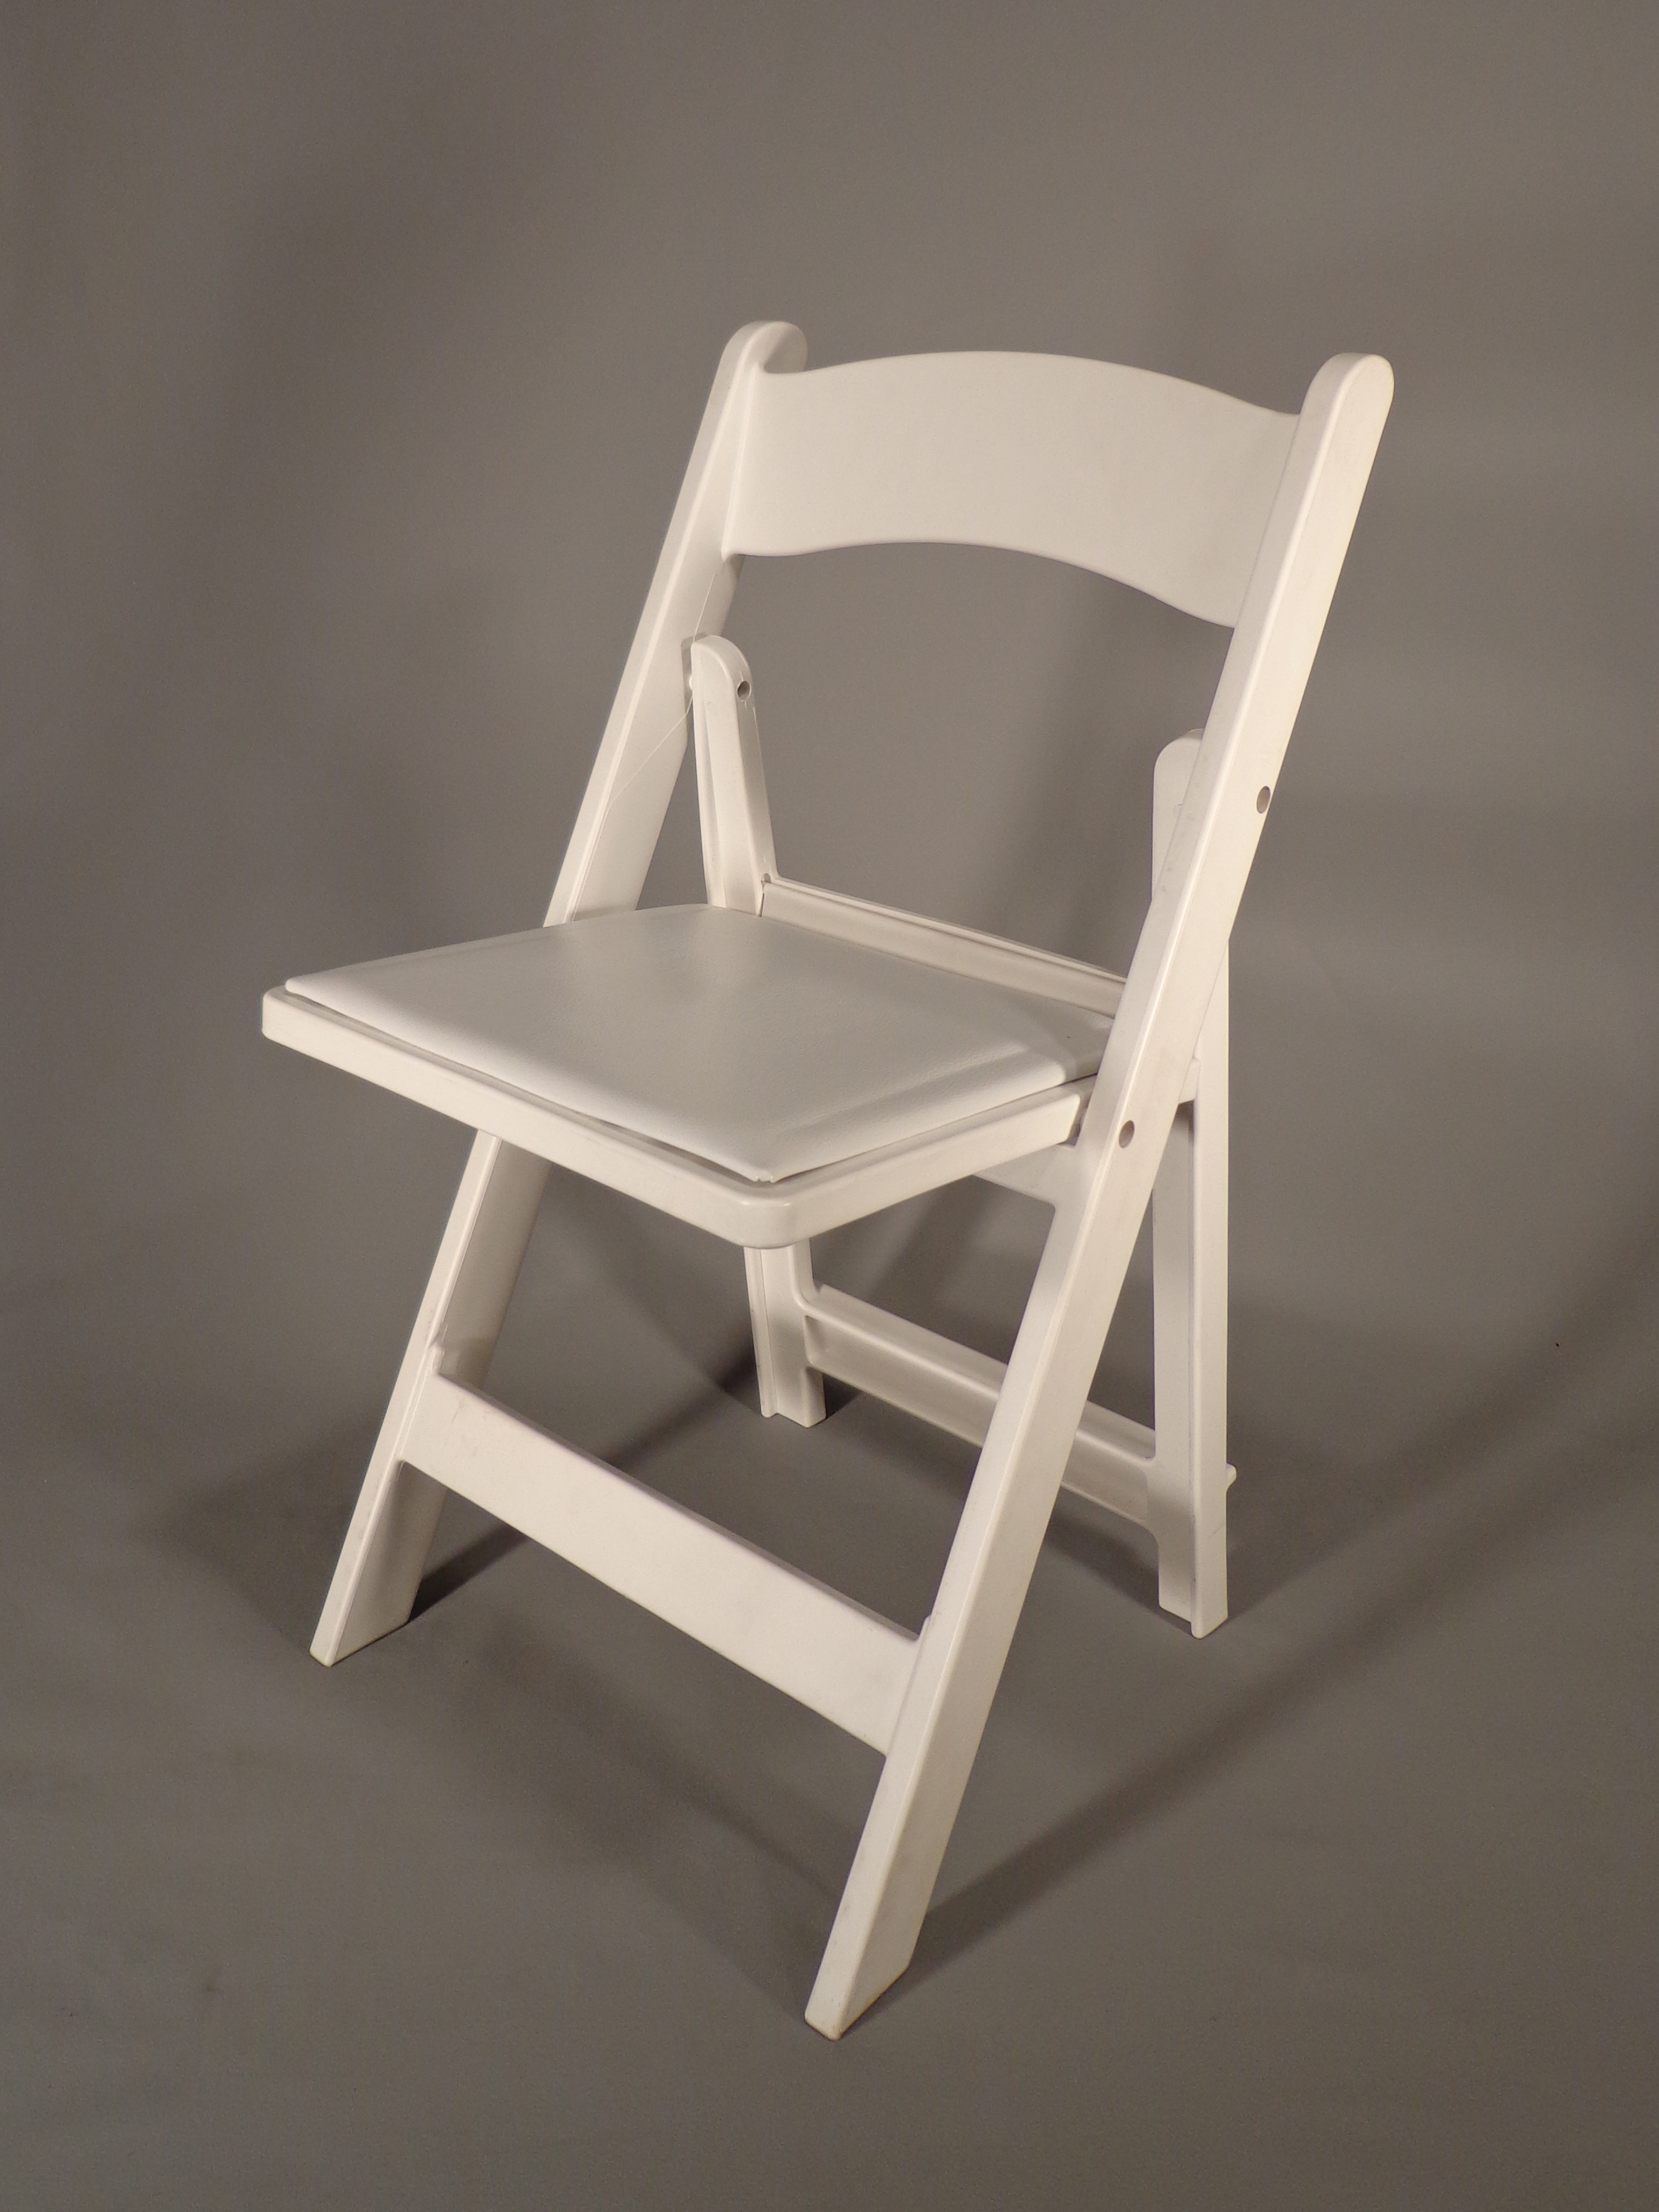 Folding chair White Resin